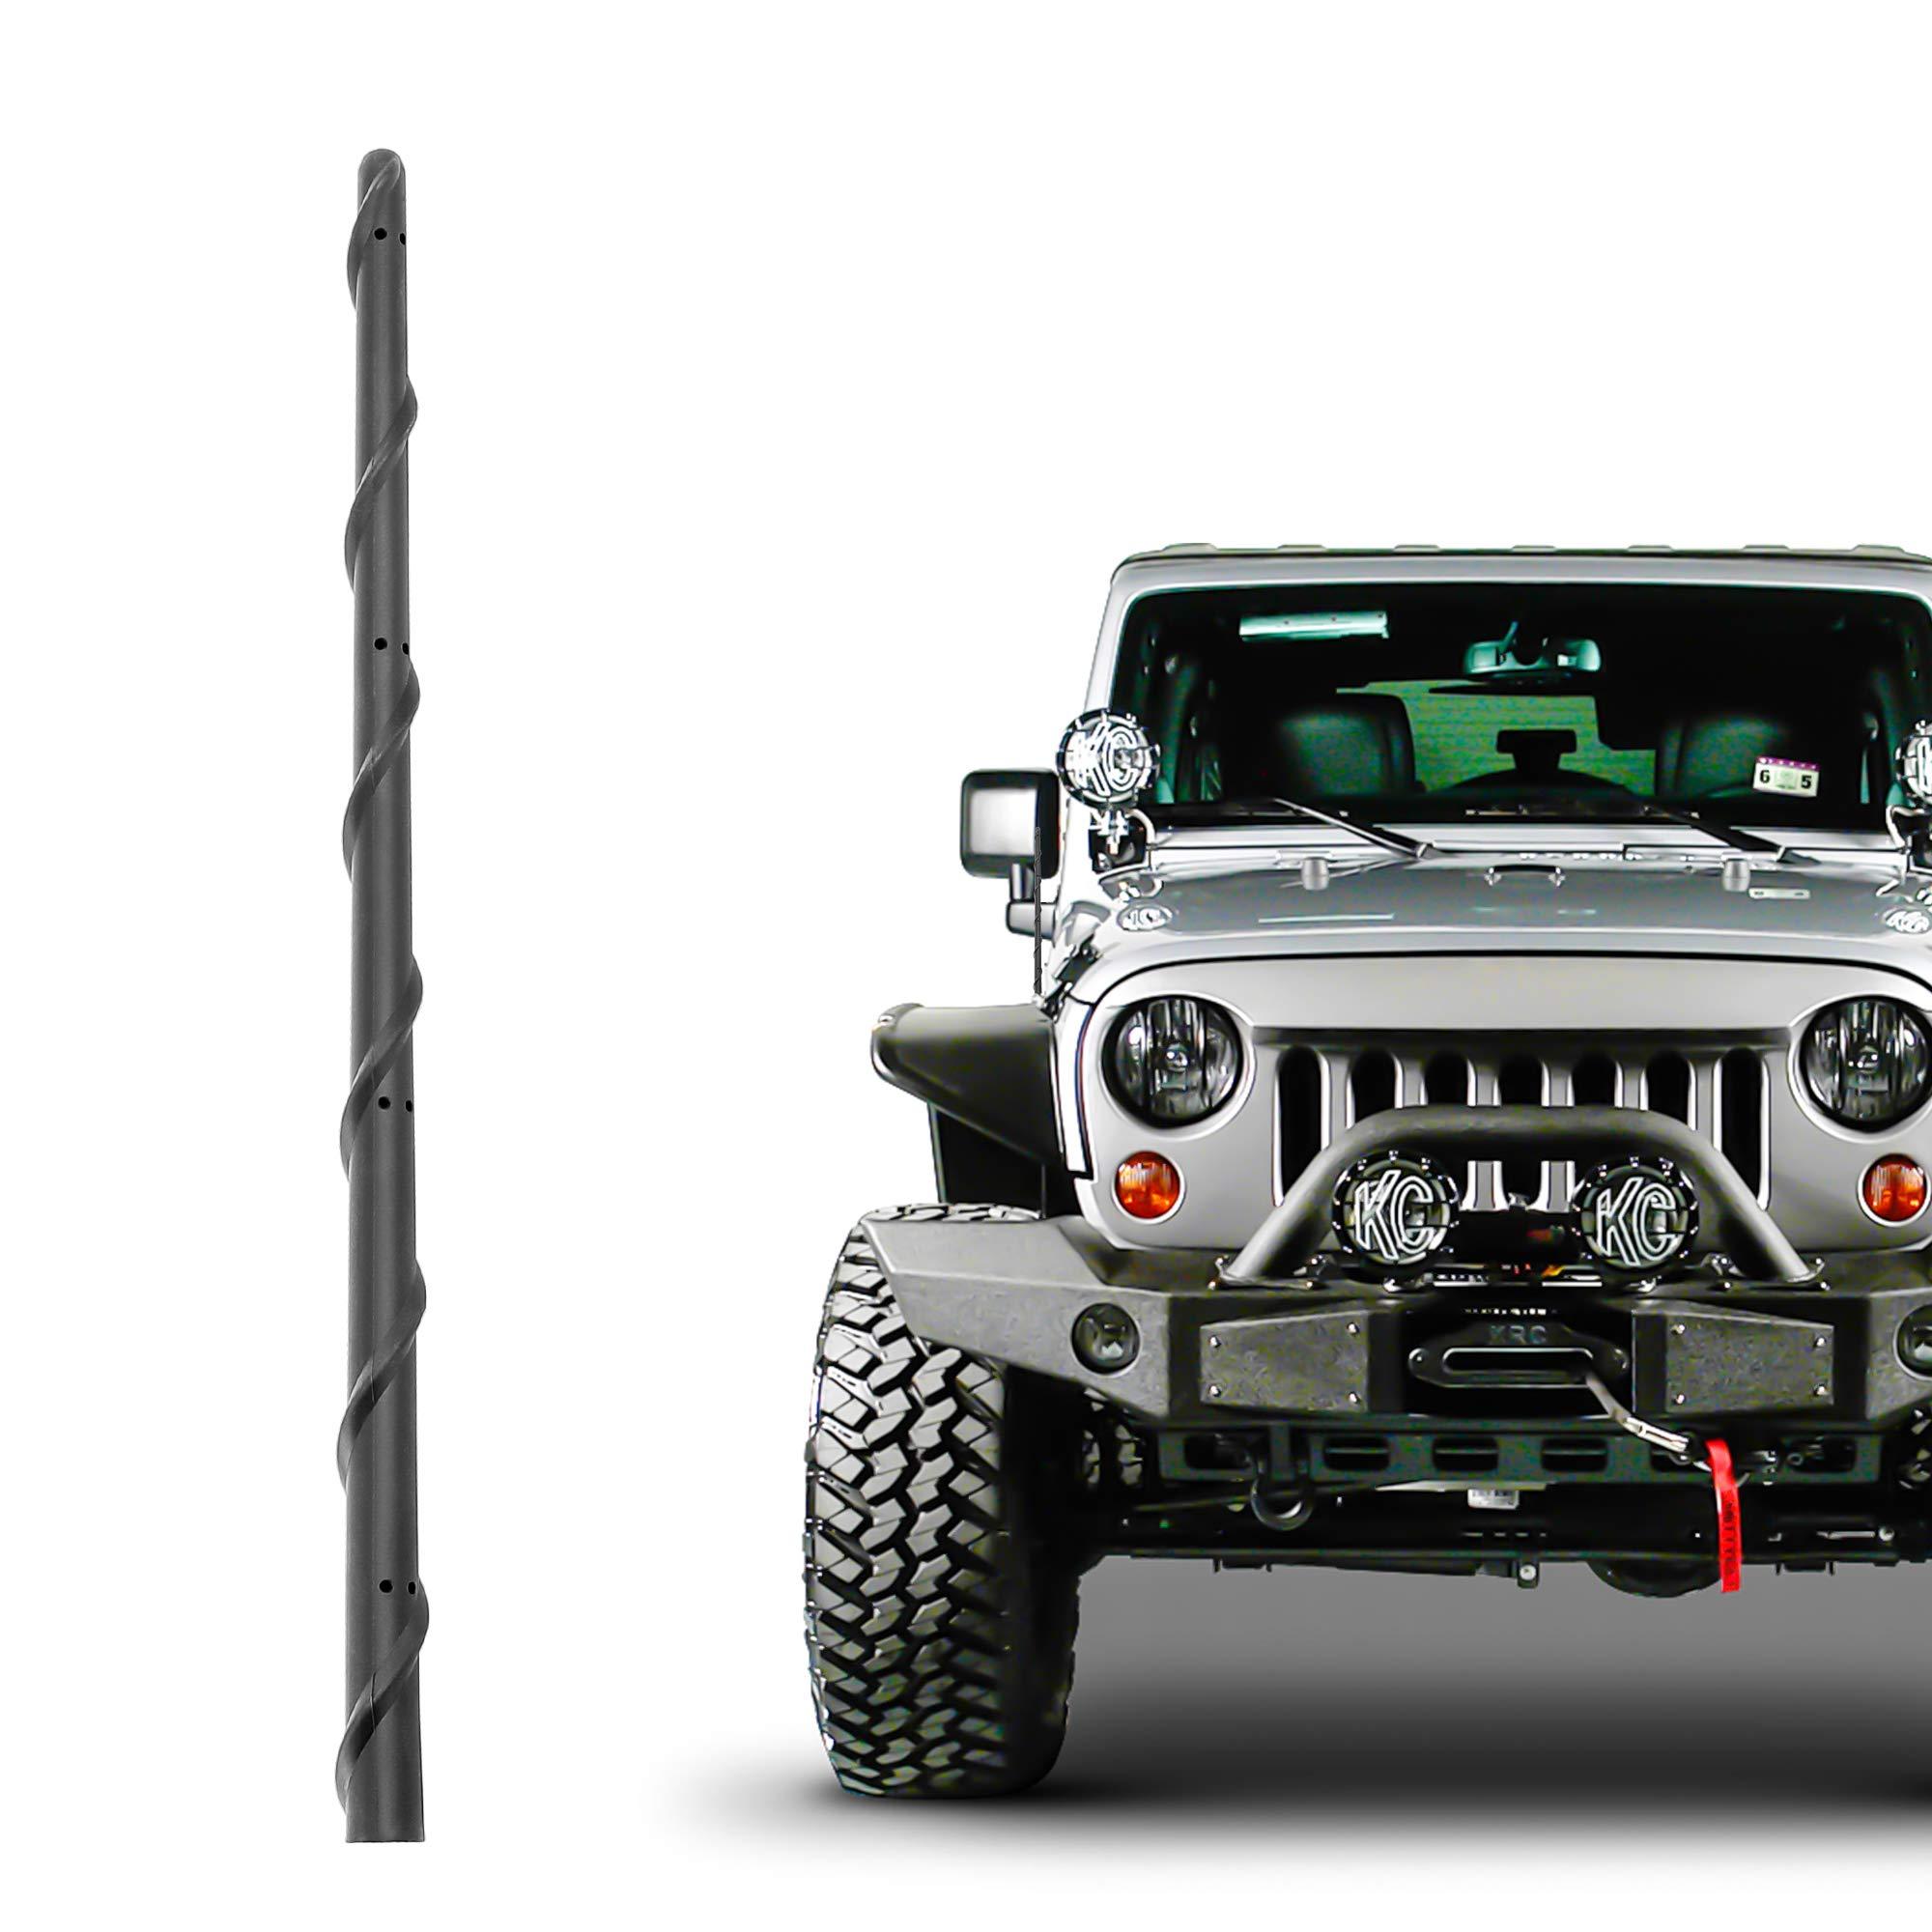 2020 2007-2020 2007-2020 Jeep Gladiator 2006-2020 JL Jeep Gladiator Jeep Compass The Stubby Short Antenna for Jeep Wrangler JK JKU JL JLU Rubicon Sahara Blue JT